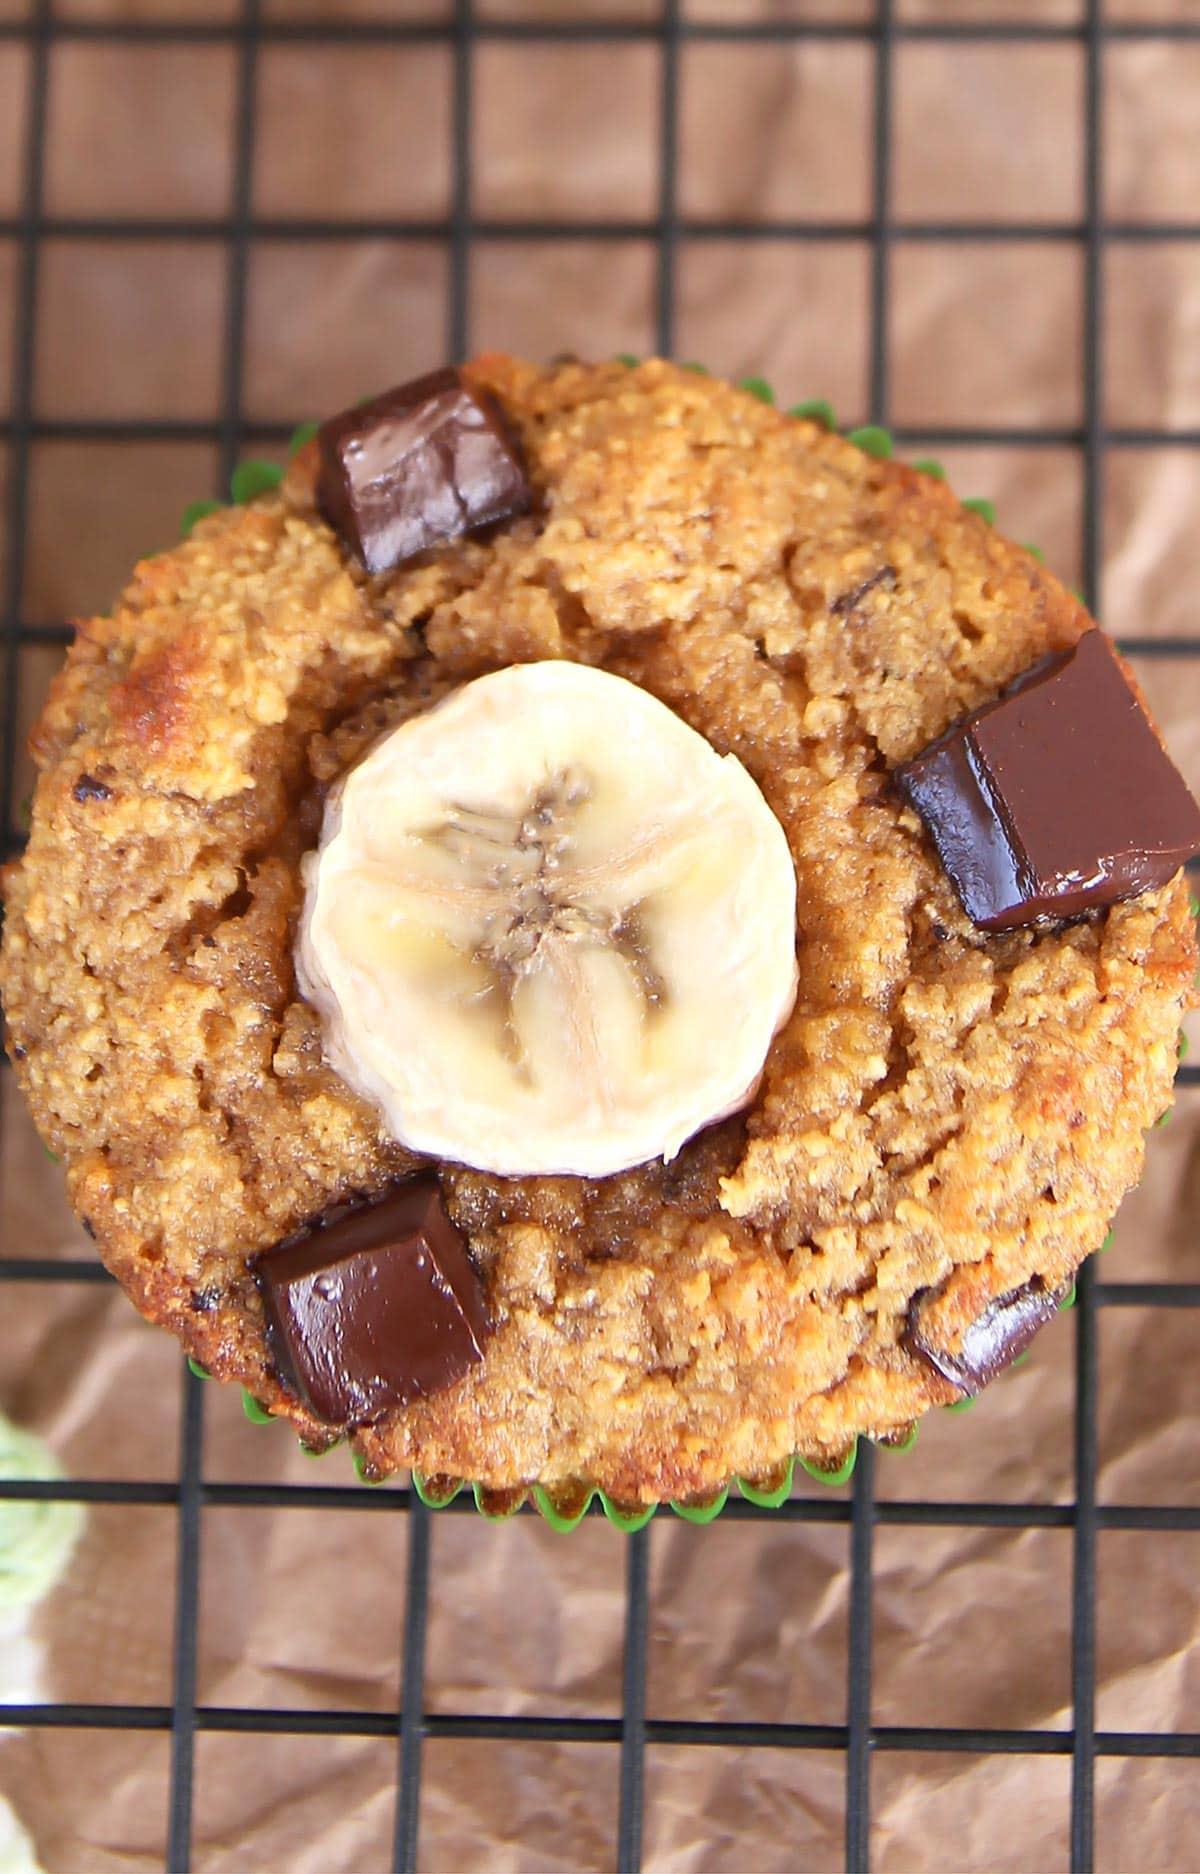 Closeup of gluten free banana muffin